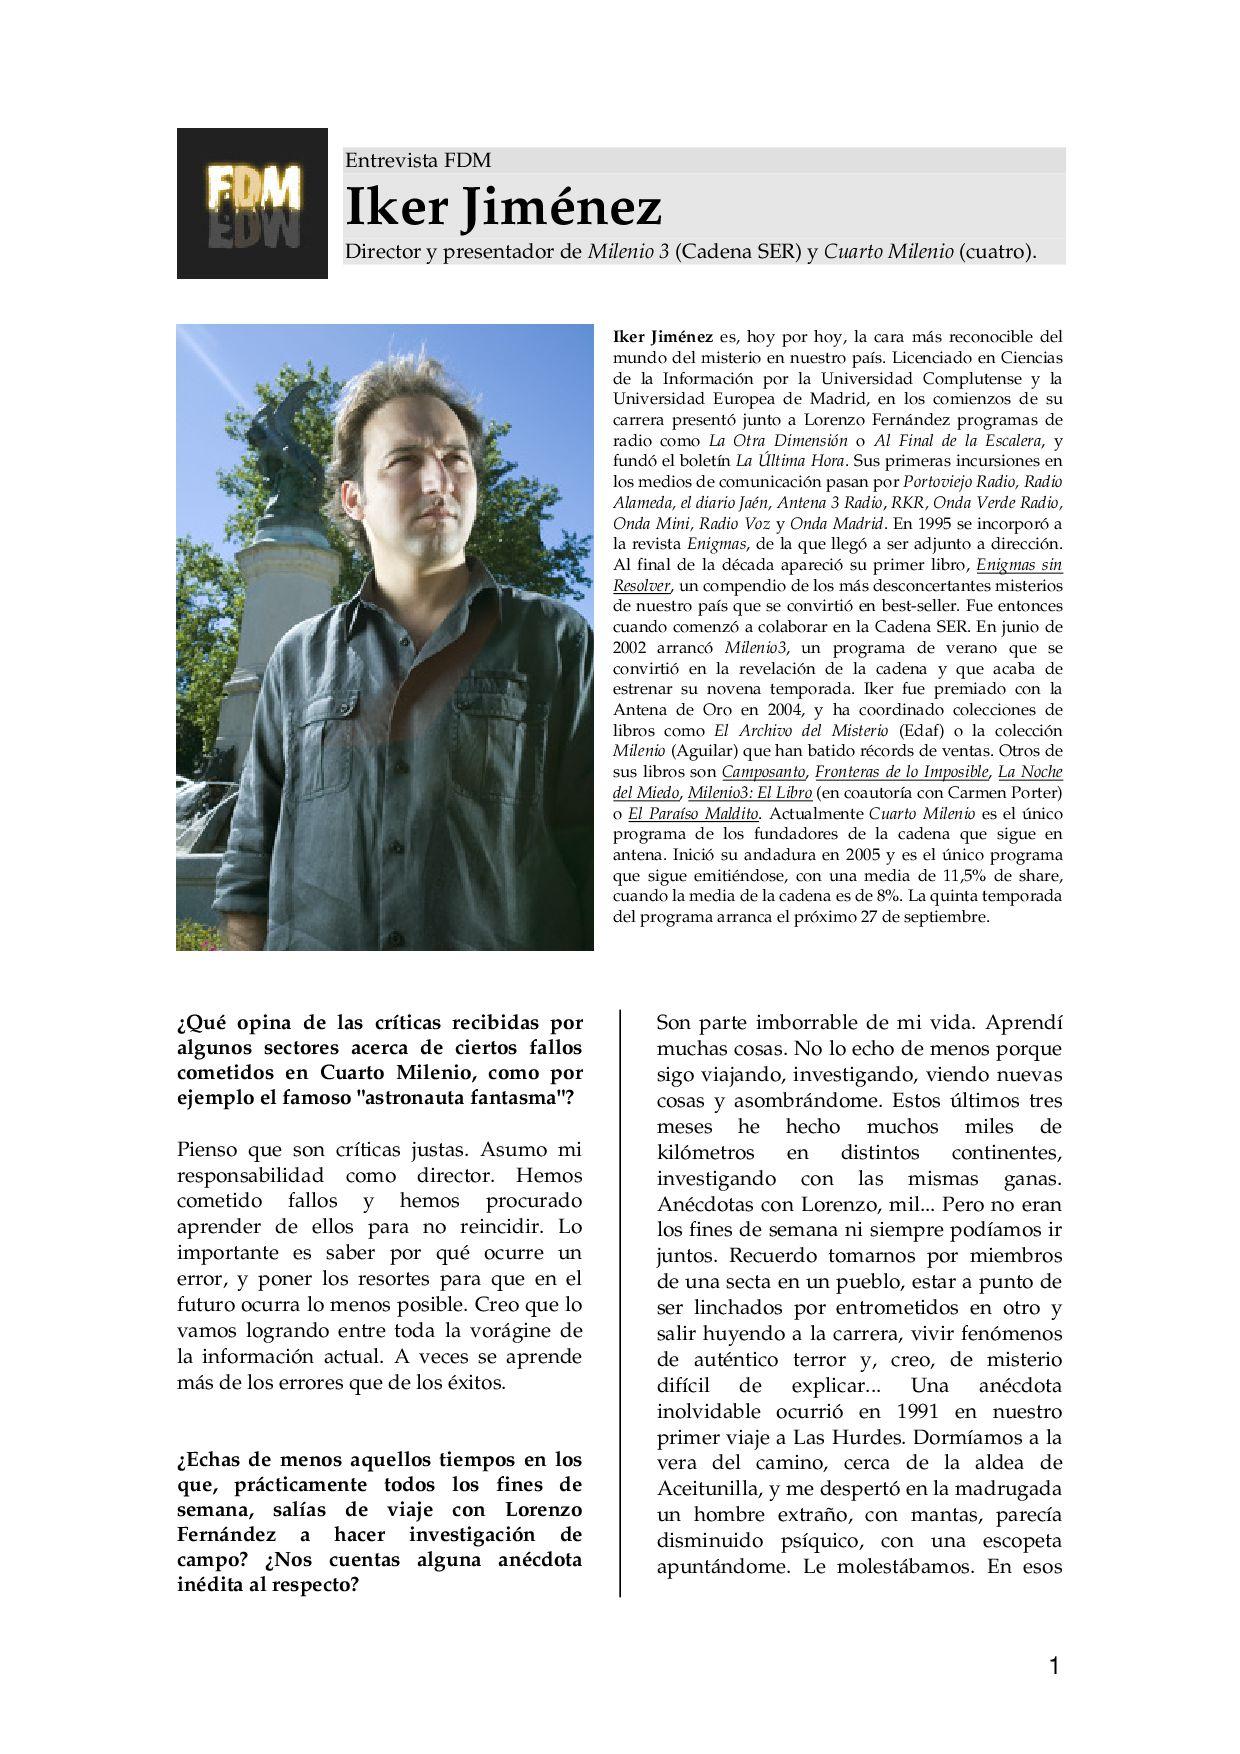 Entrevista Iker Jimenez by Diego Marañón - issuu